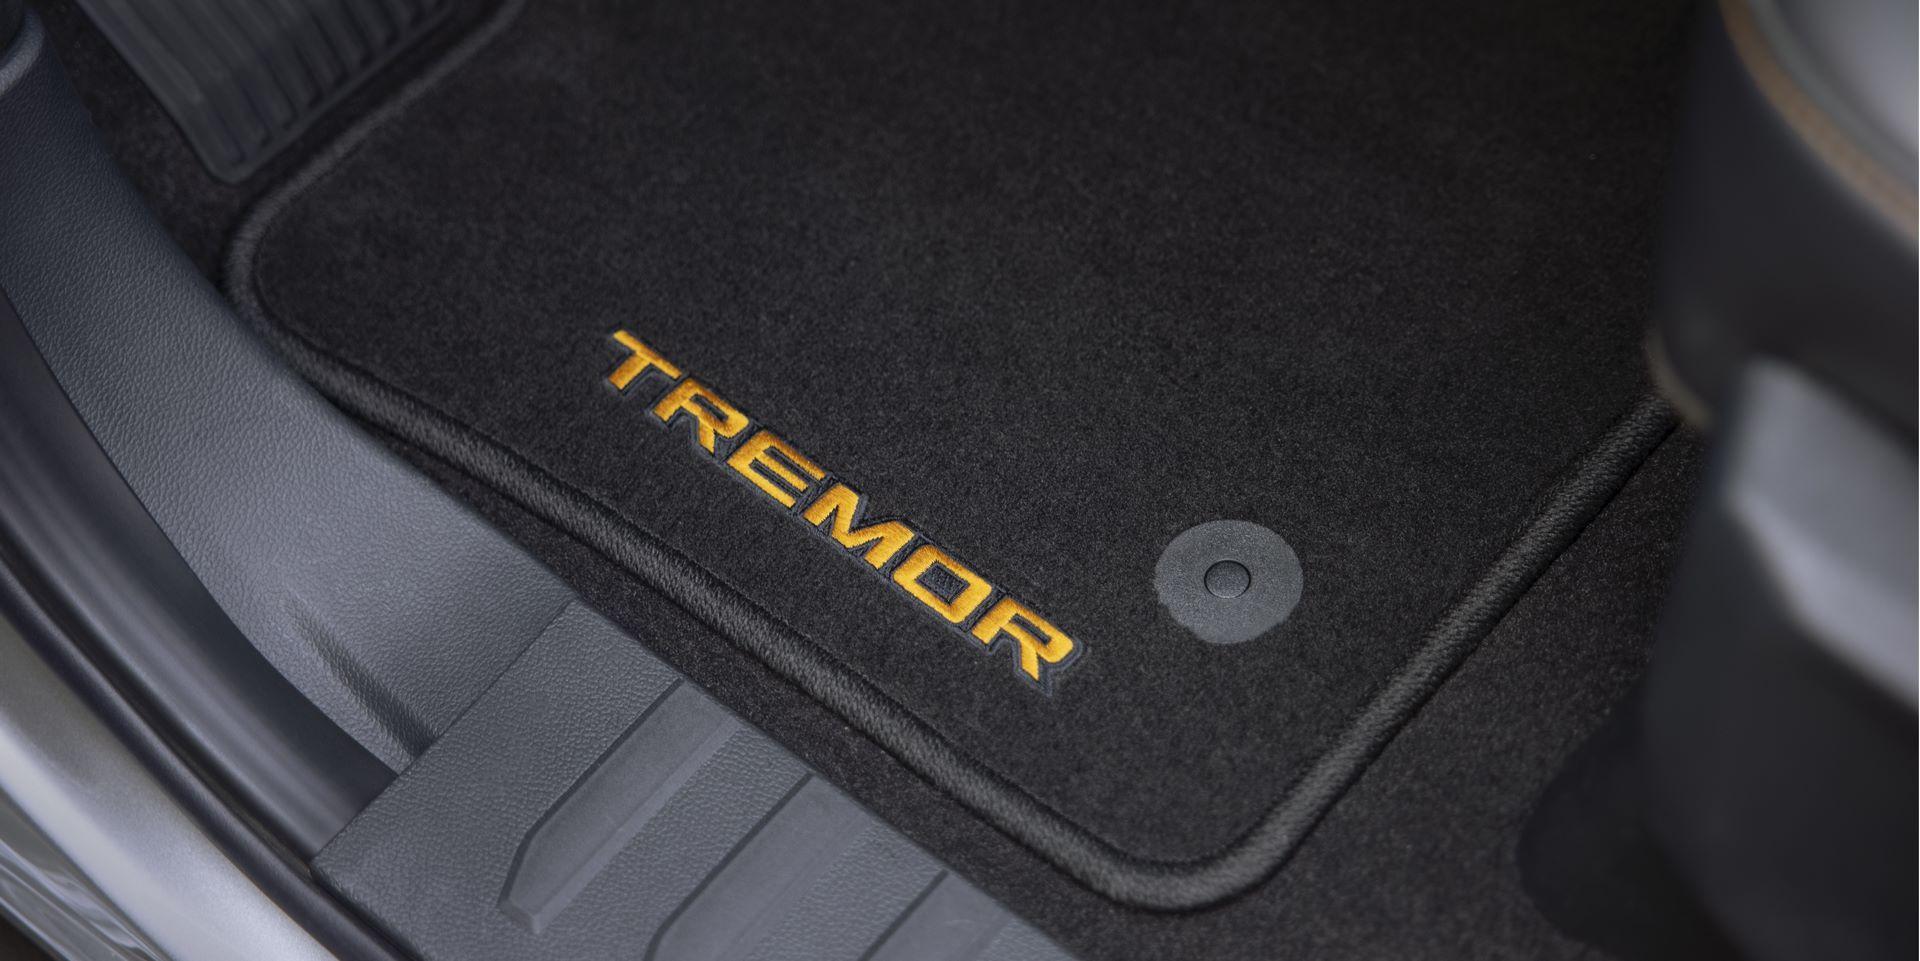 2021 Ford F-150 Tremor